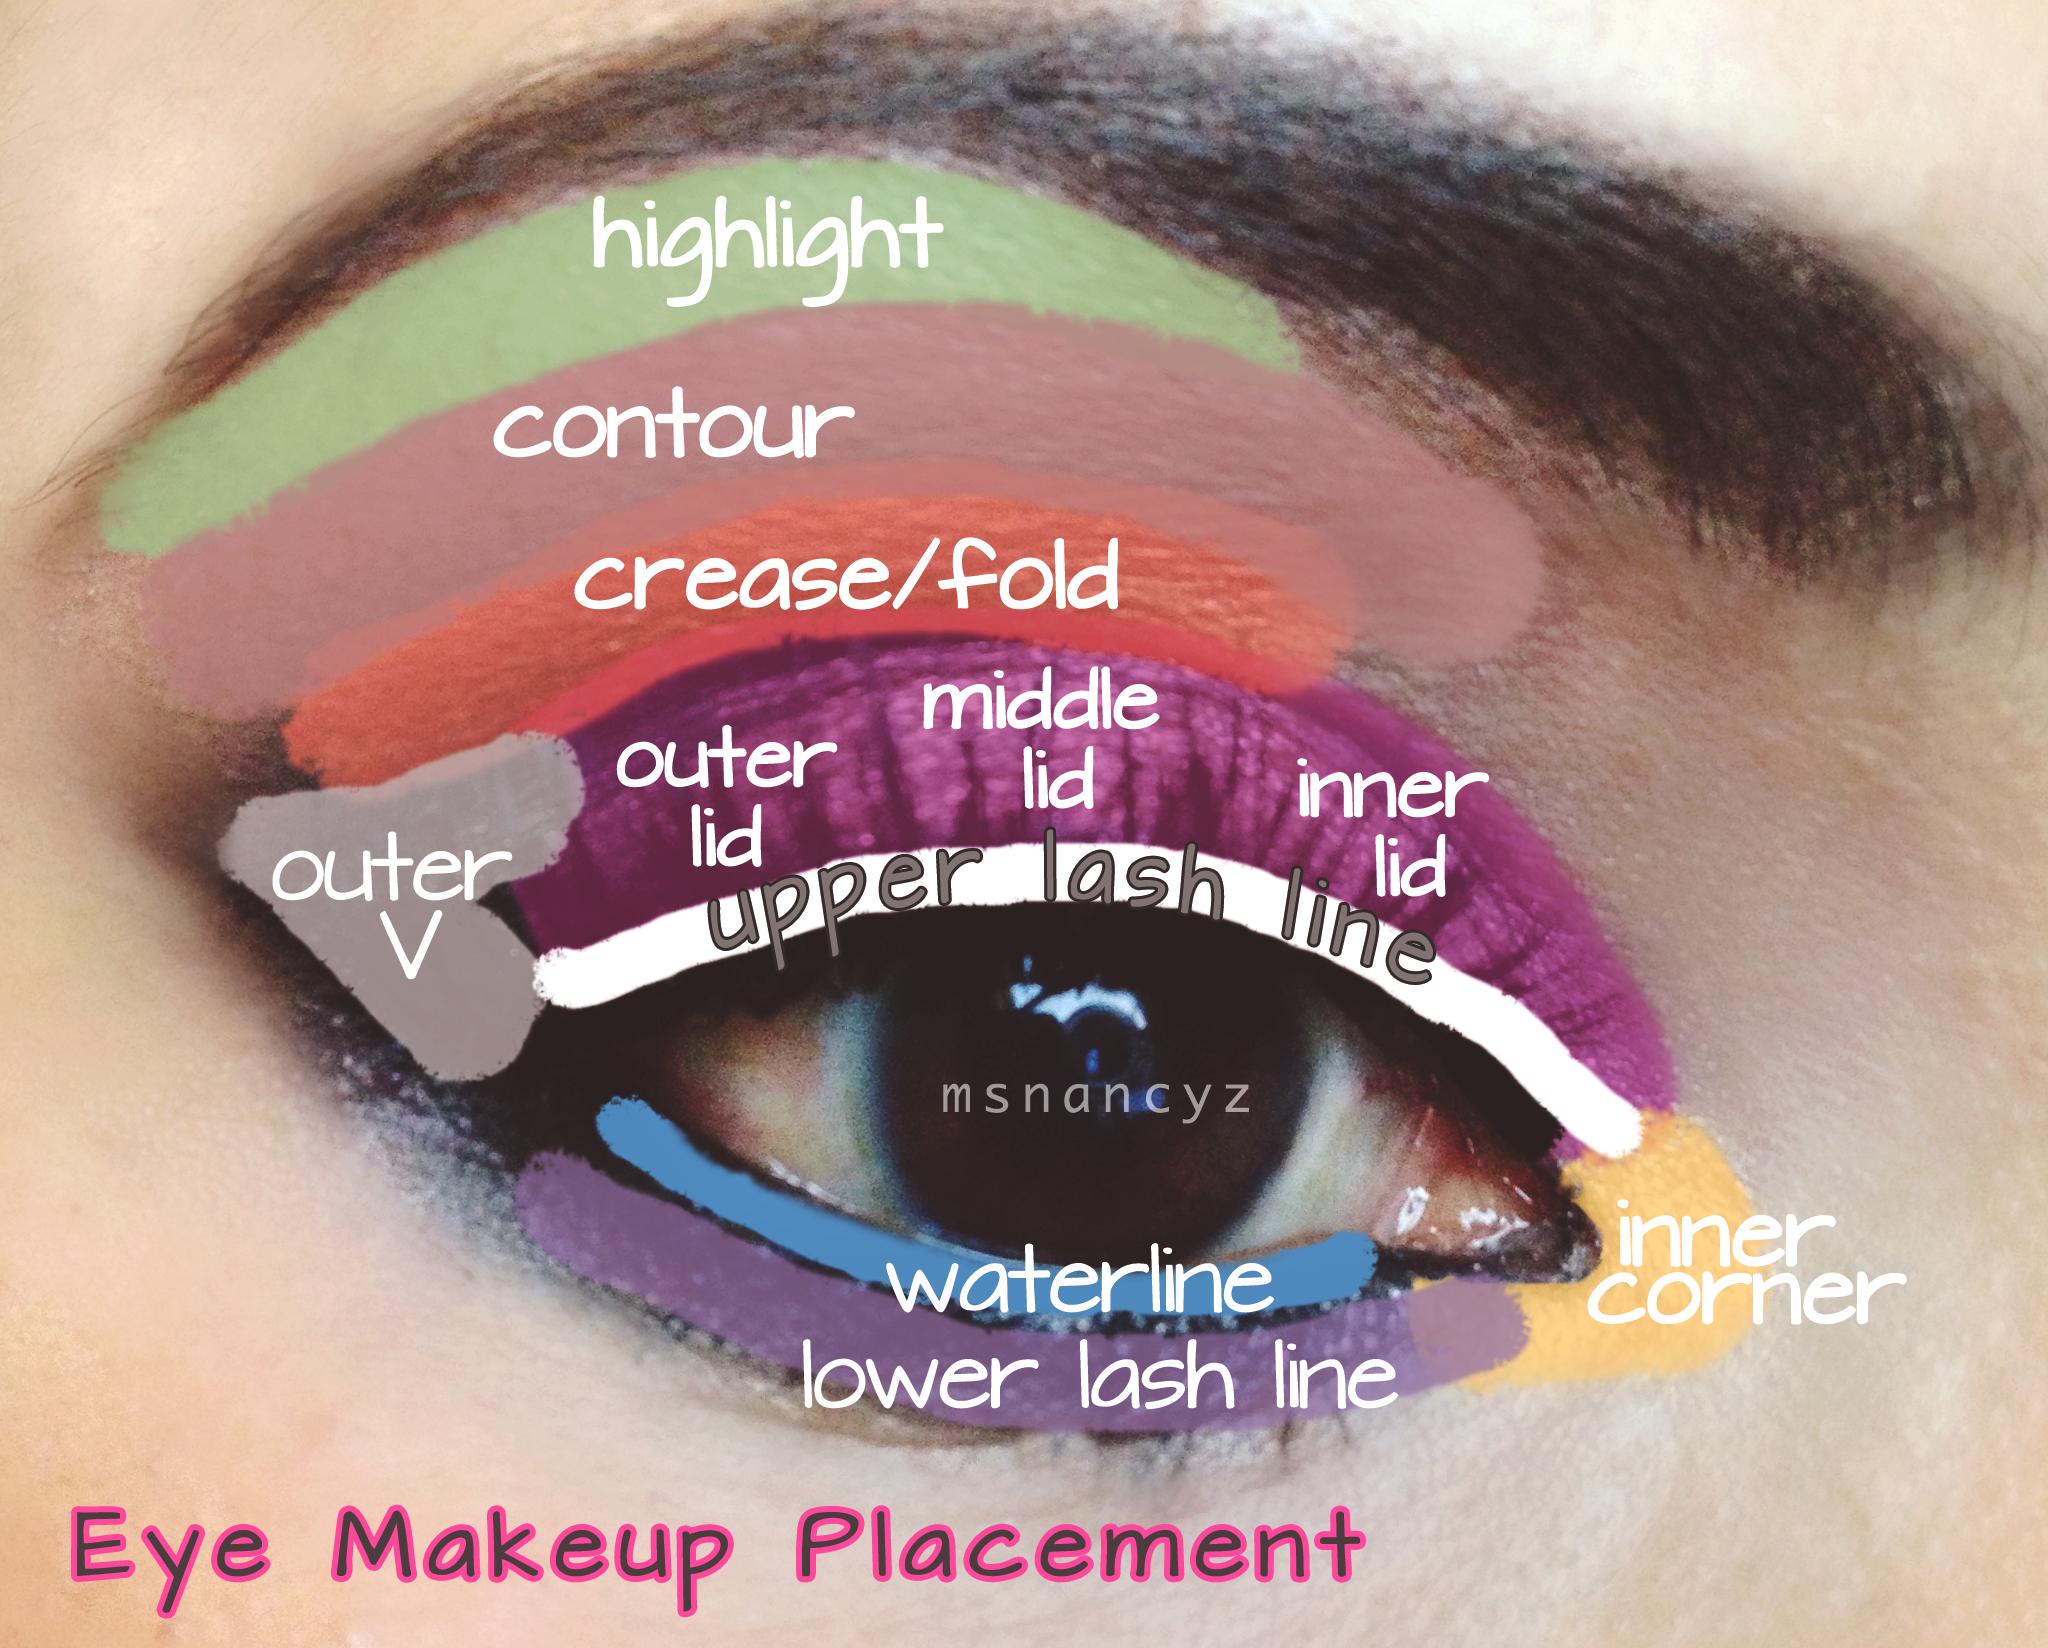 Eye shadow diagram diy wiring diagrams nature s eye eye makeup placement diagram of eye areas rh naomispenny blogspot com eyeshadow diagram mary kay eyeshadow diagram ccuart Images